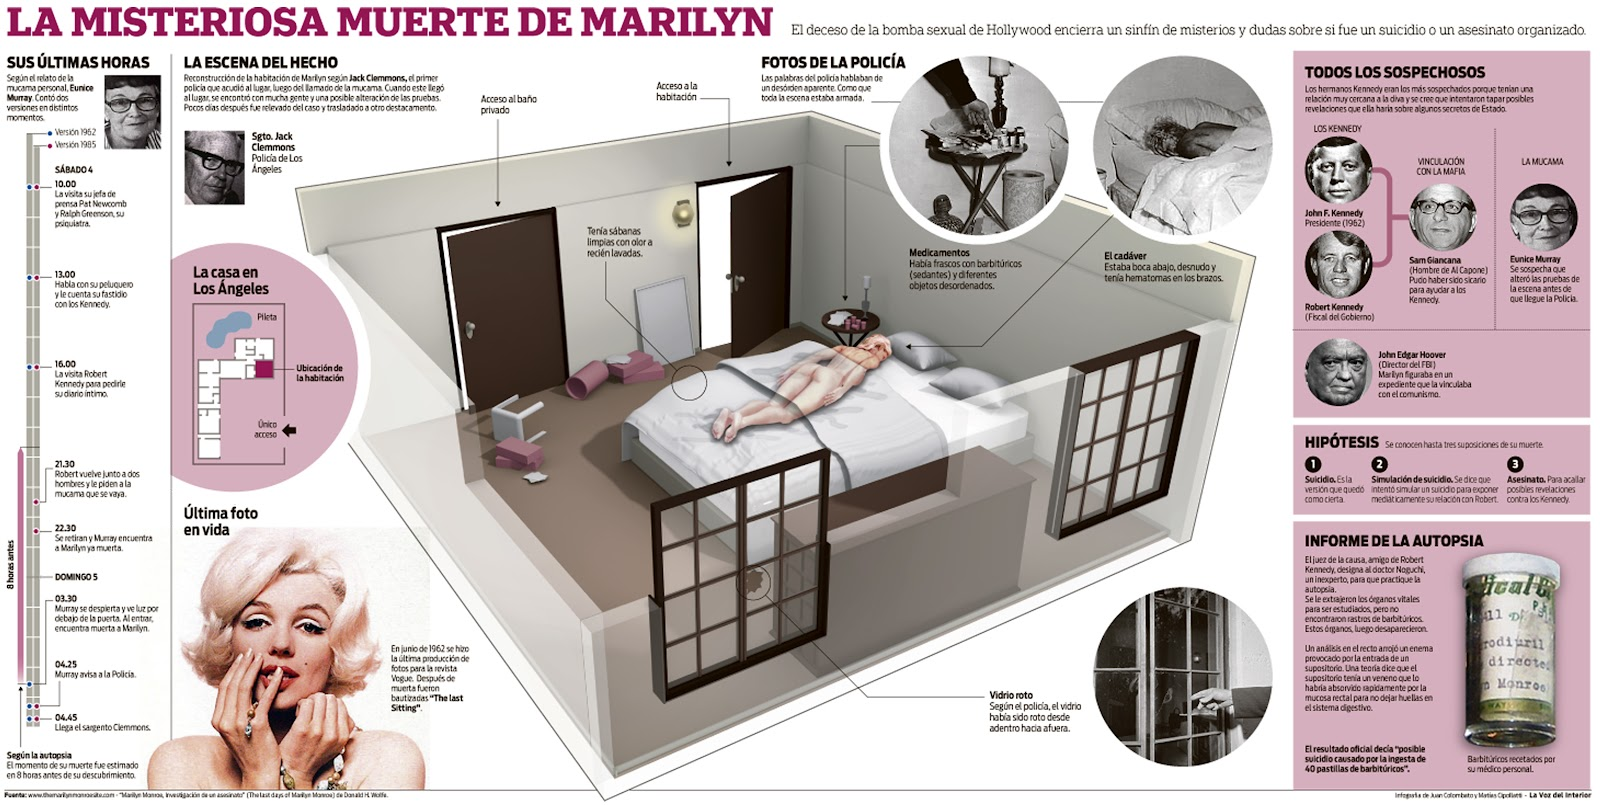 La misteriosa muerte de Marilyn Monroe (Infografía)